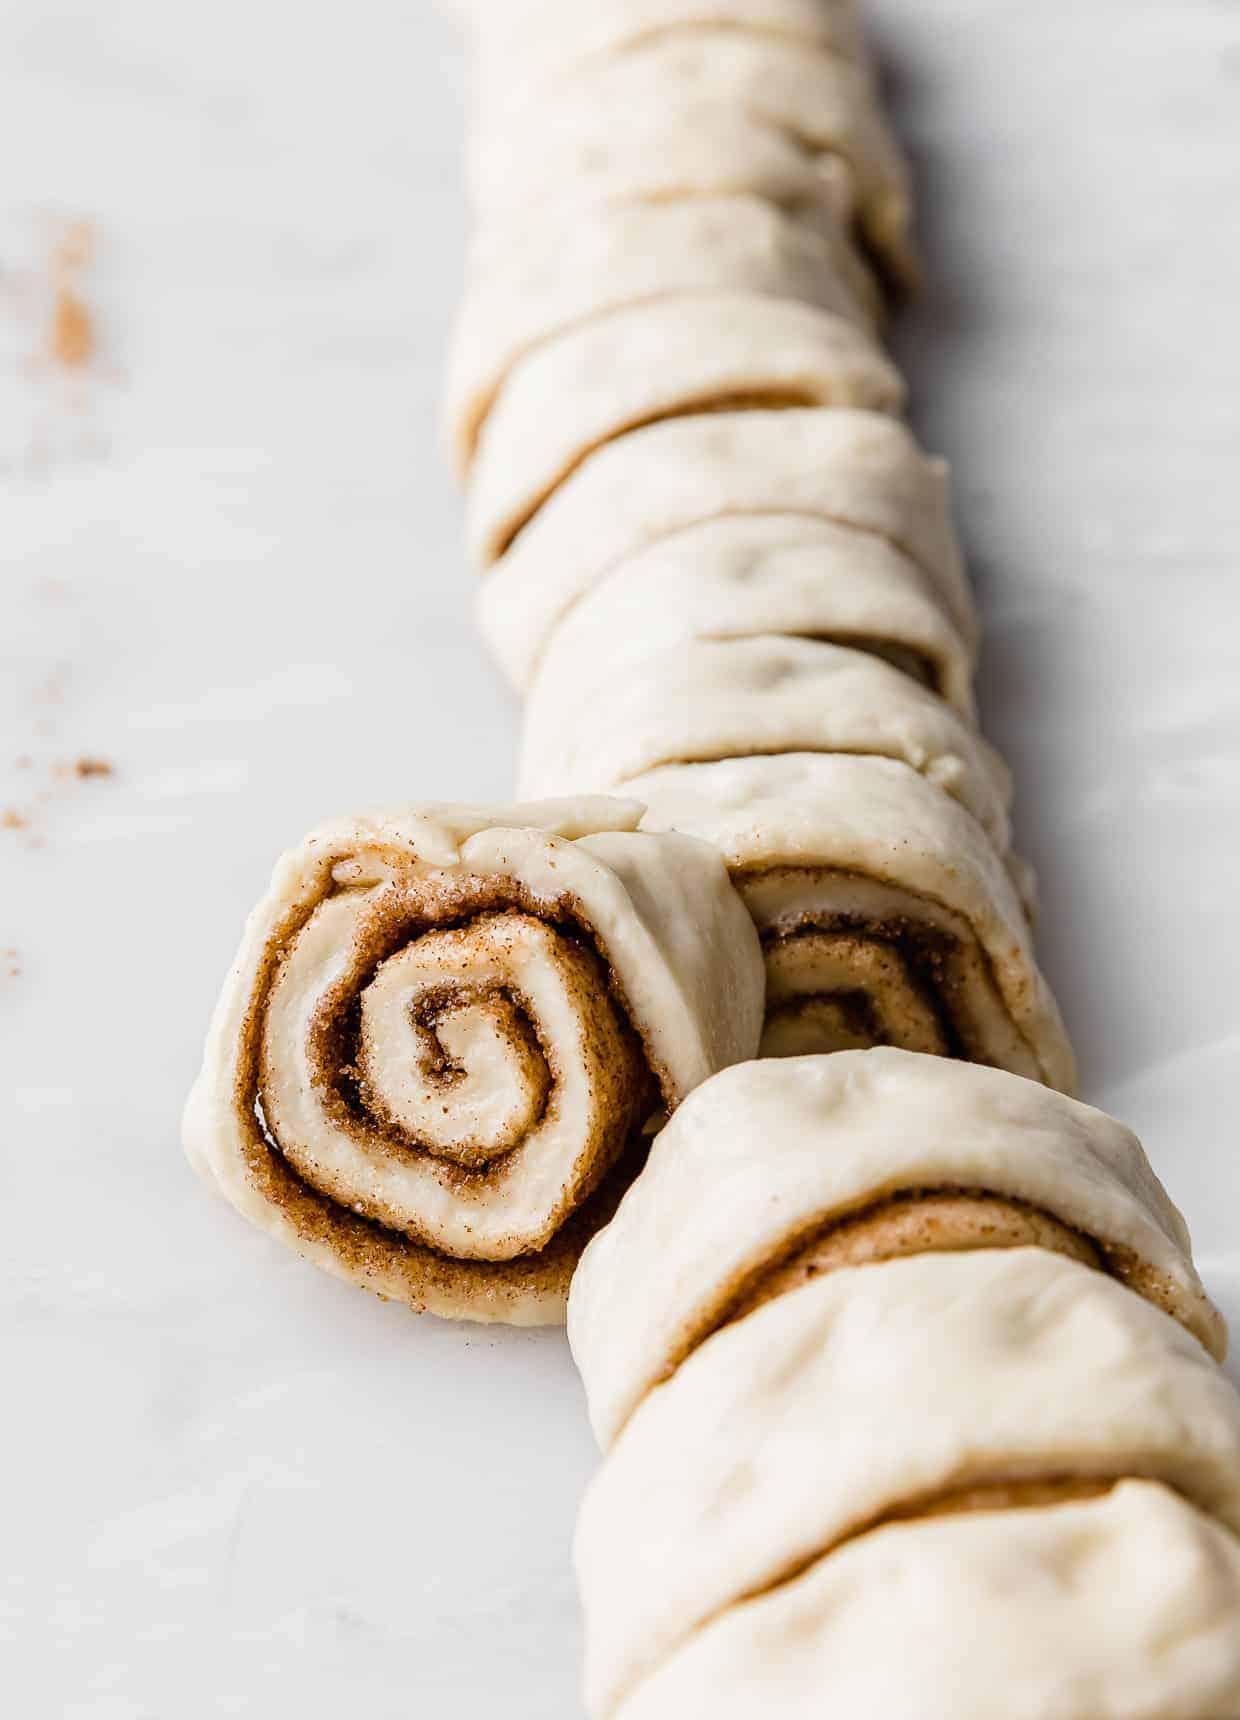 A raw mini cinnamon roll against a white background.